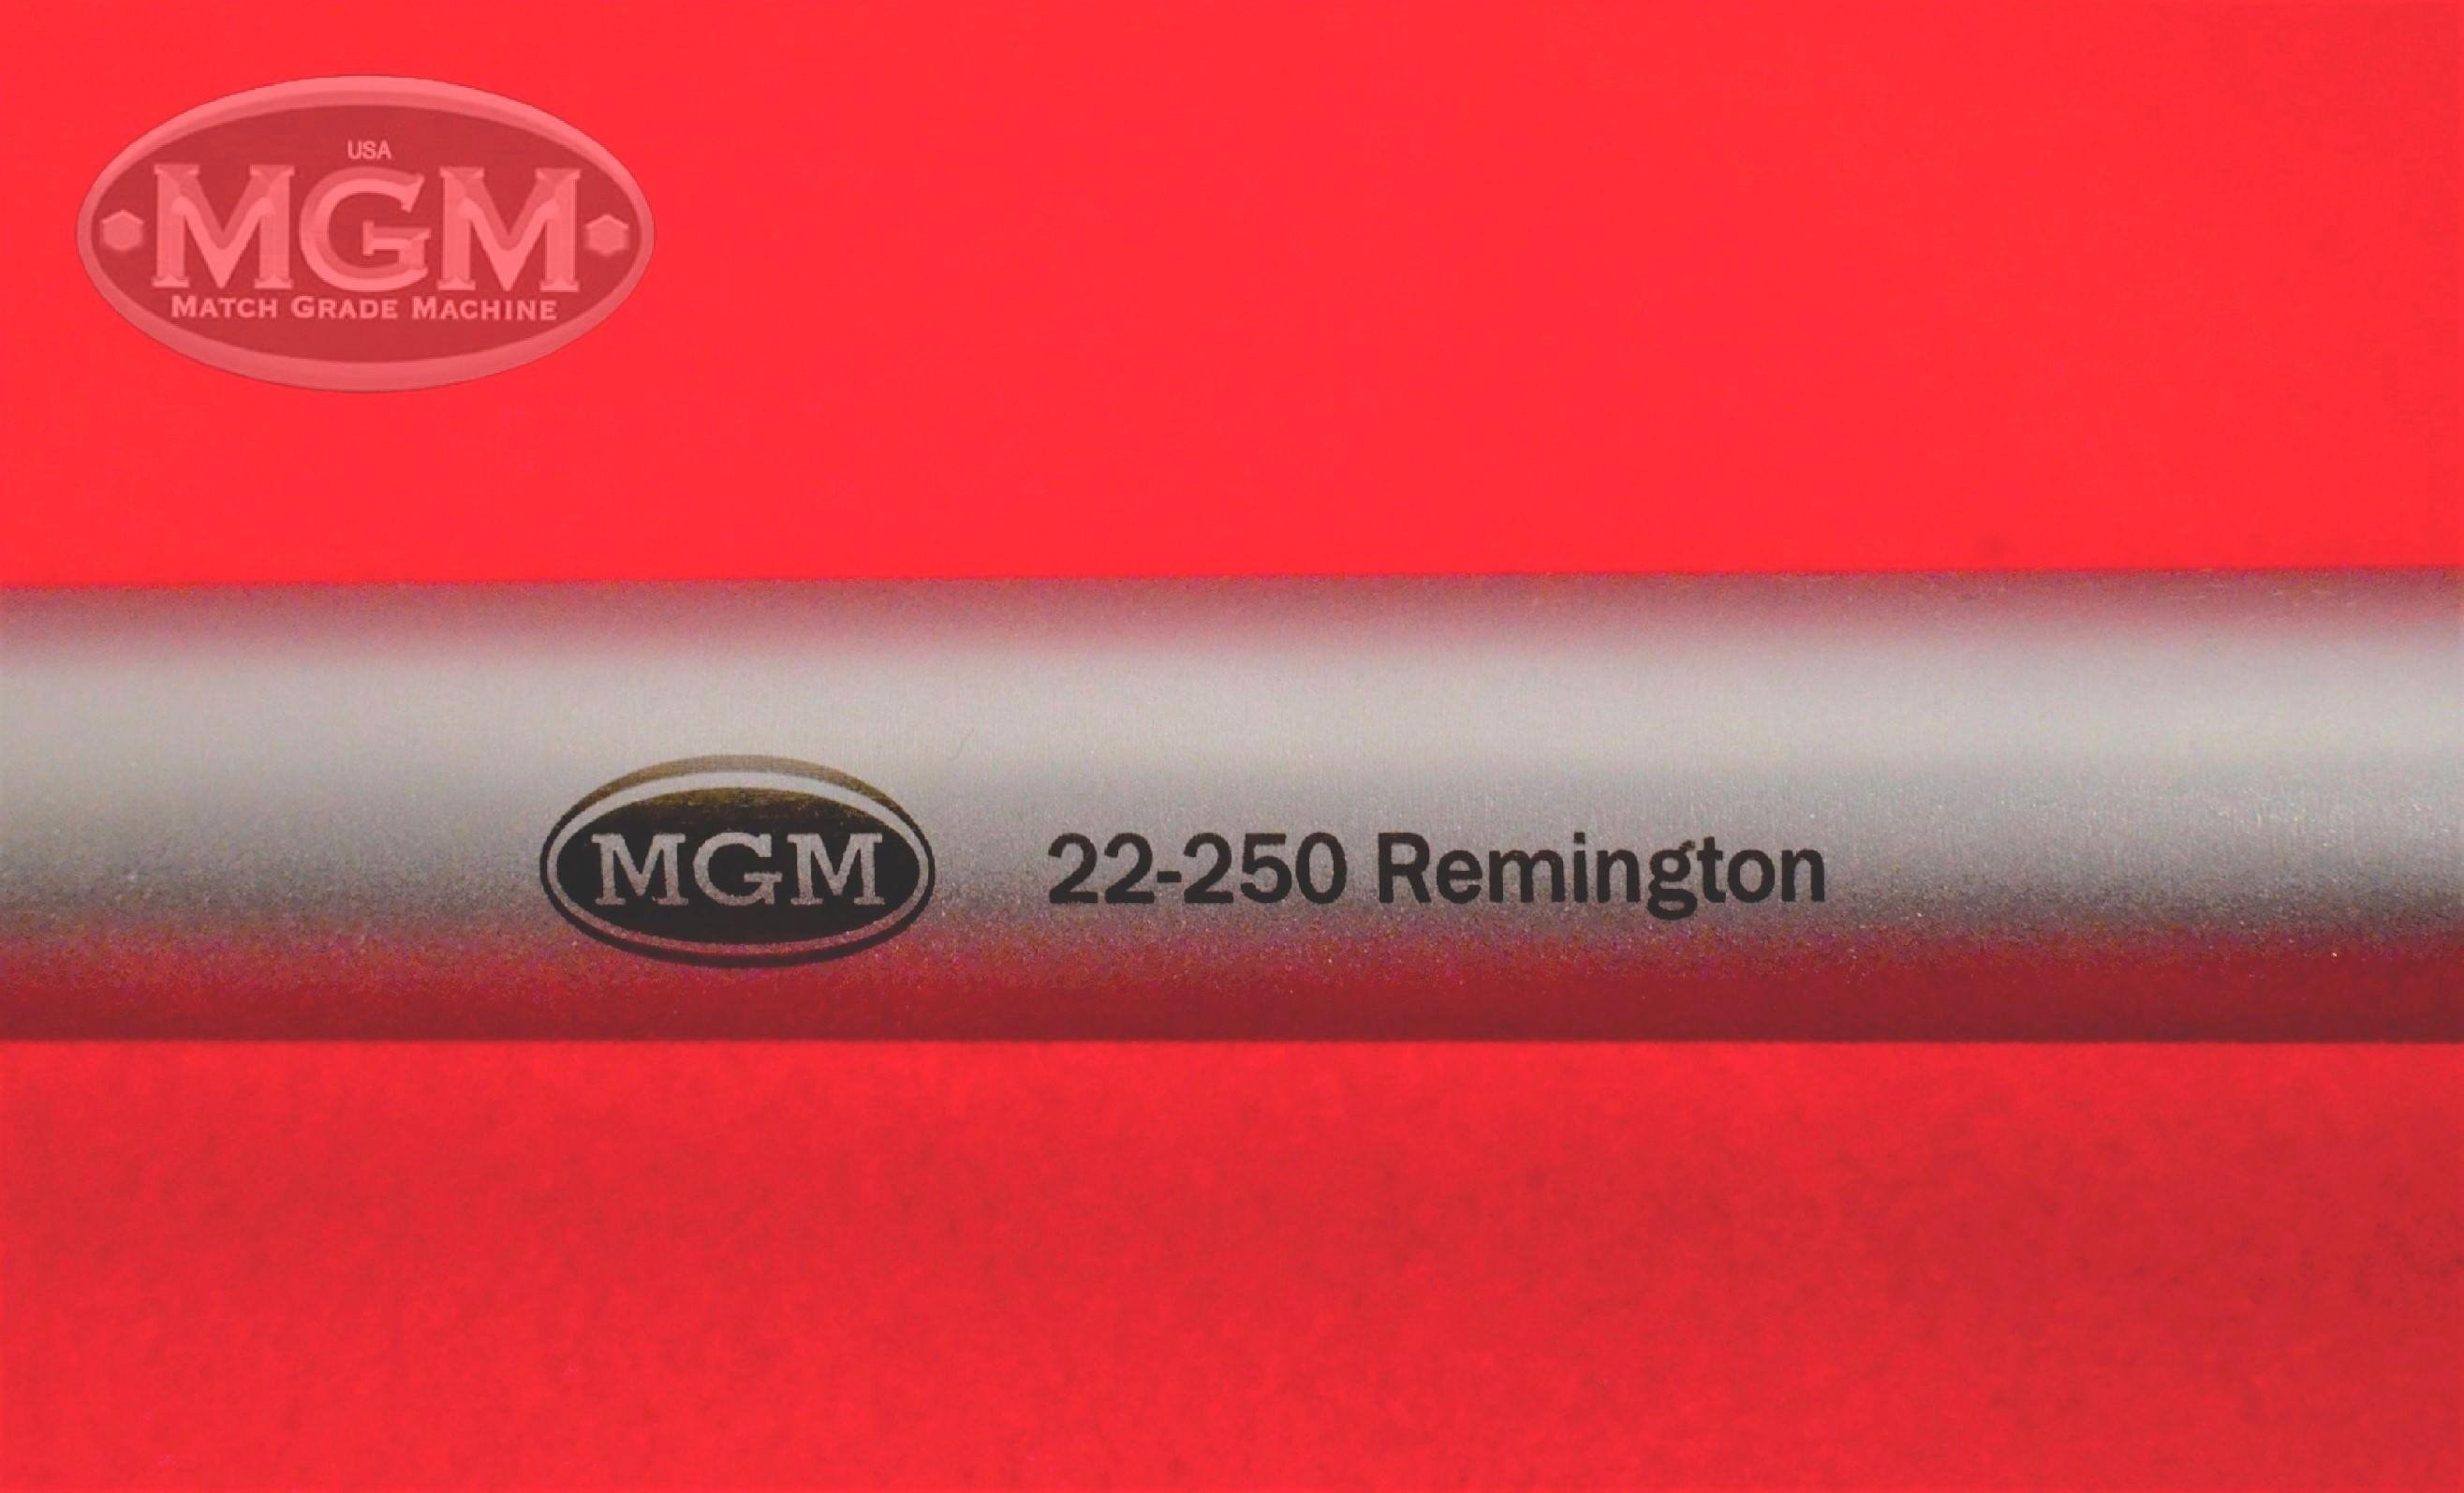 22-250, Stainless, Match Grade Machine, MGM, Thompson Center, Encore